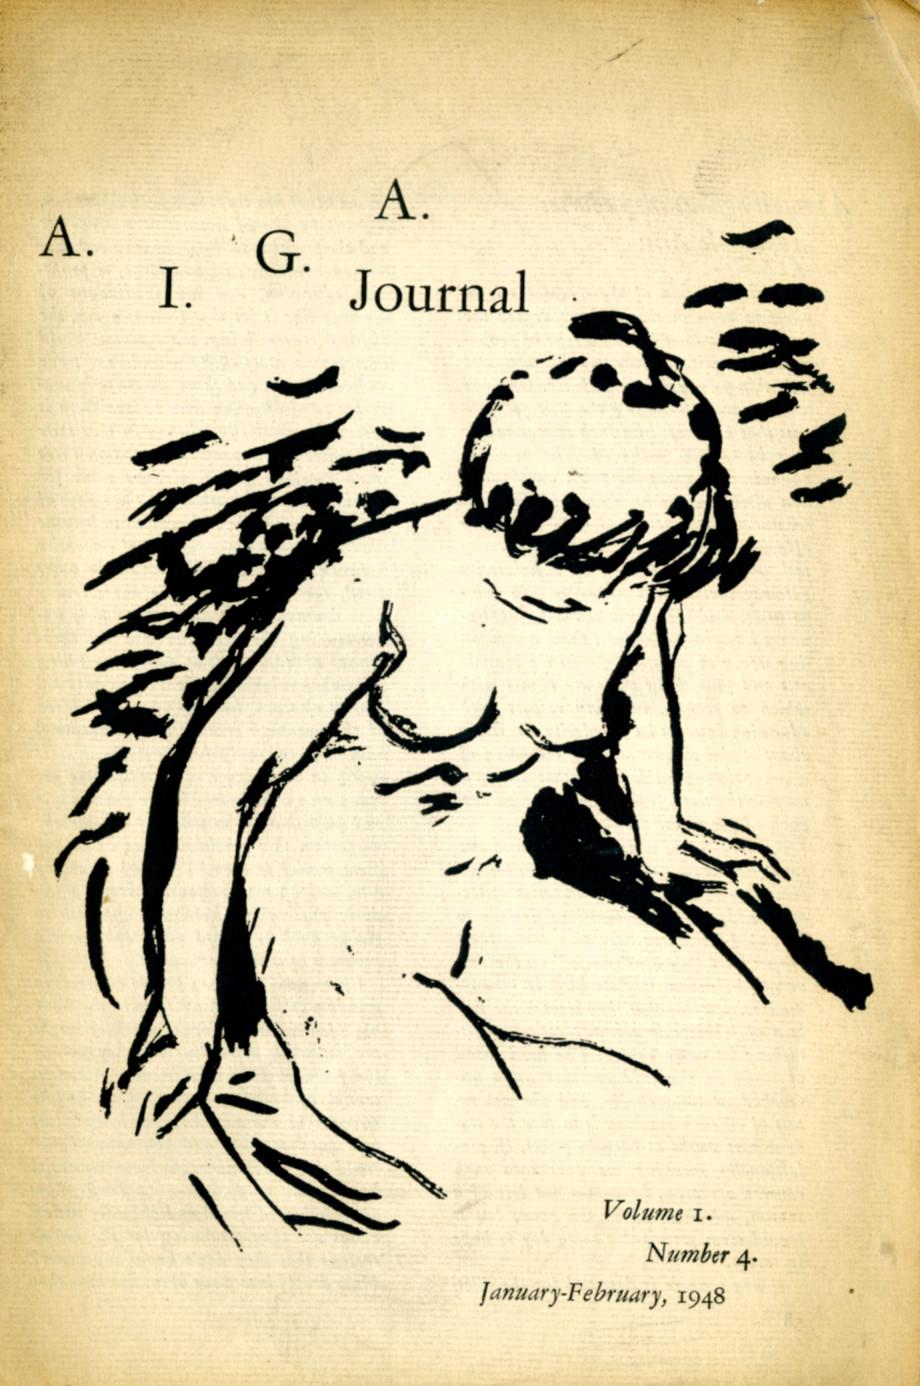 Paul Rand AIGA Journal